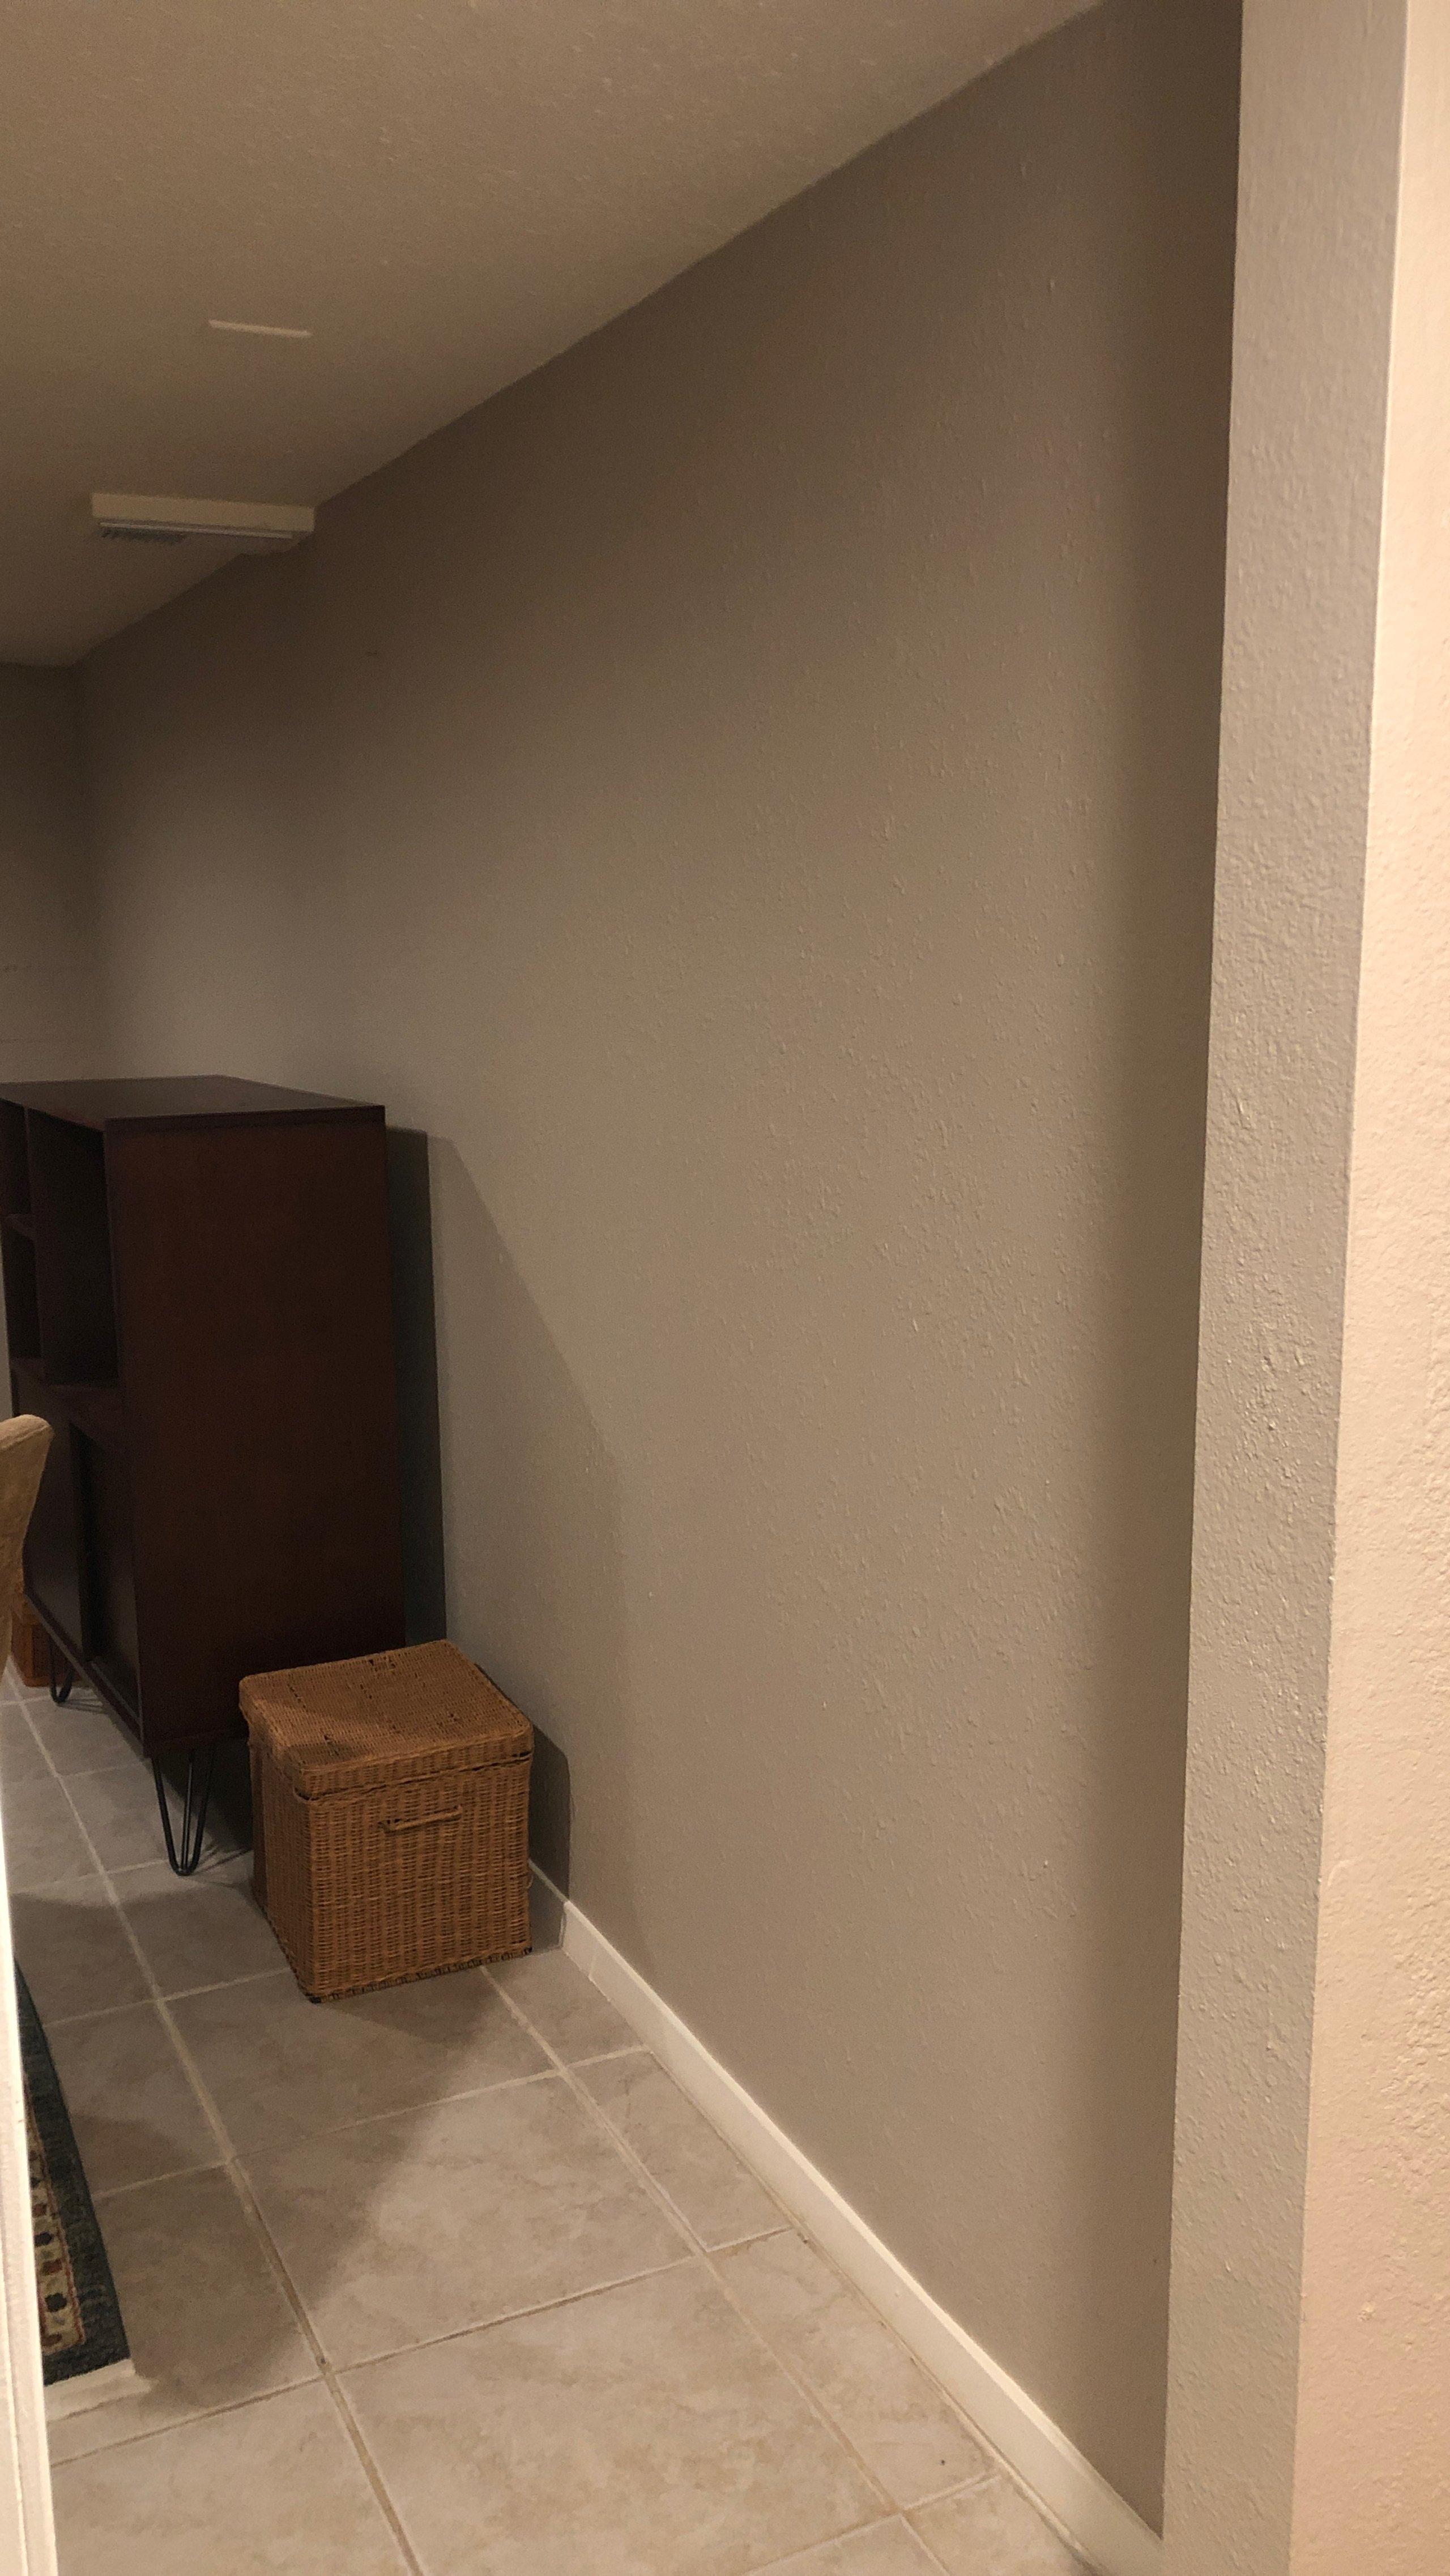 15x13 Basement self storage unit